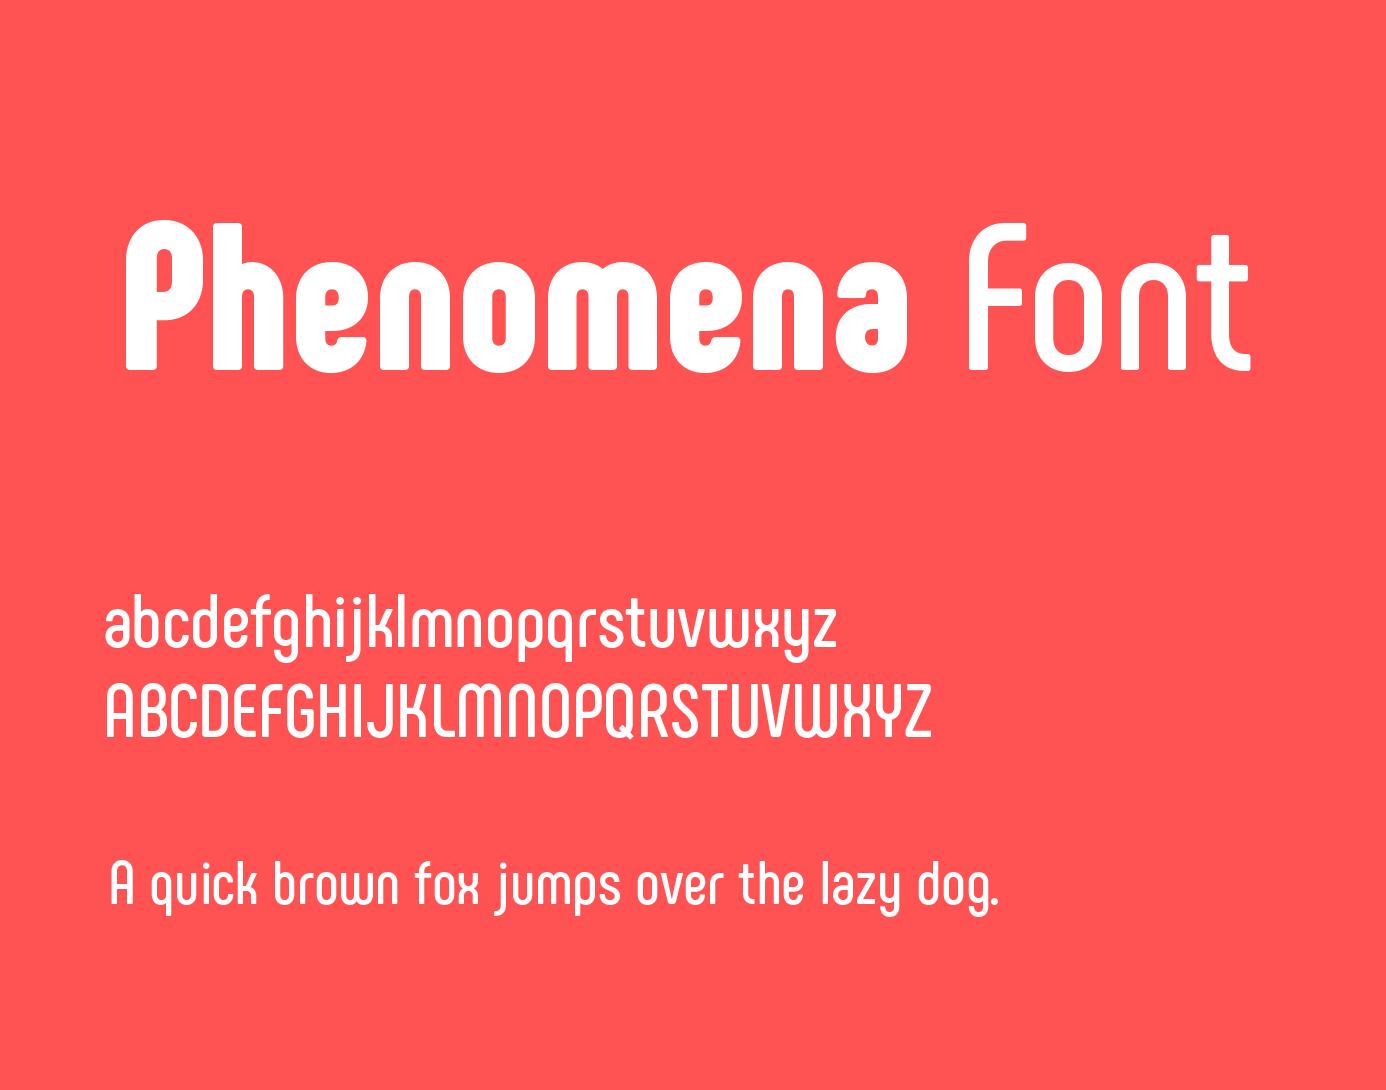 https://fontclarity.com/wp-content/uploads/2019/09/phenomena-download-0.png Free Download